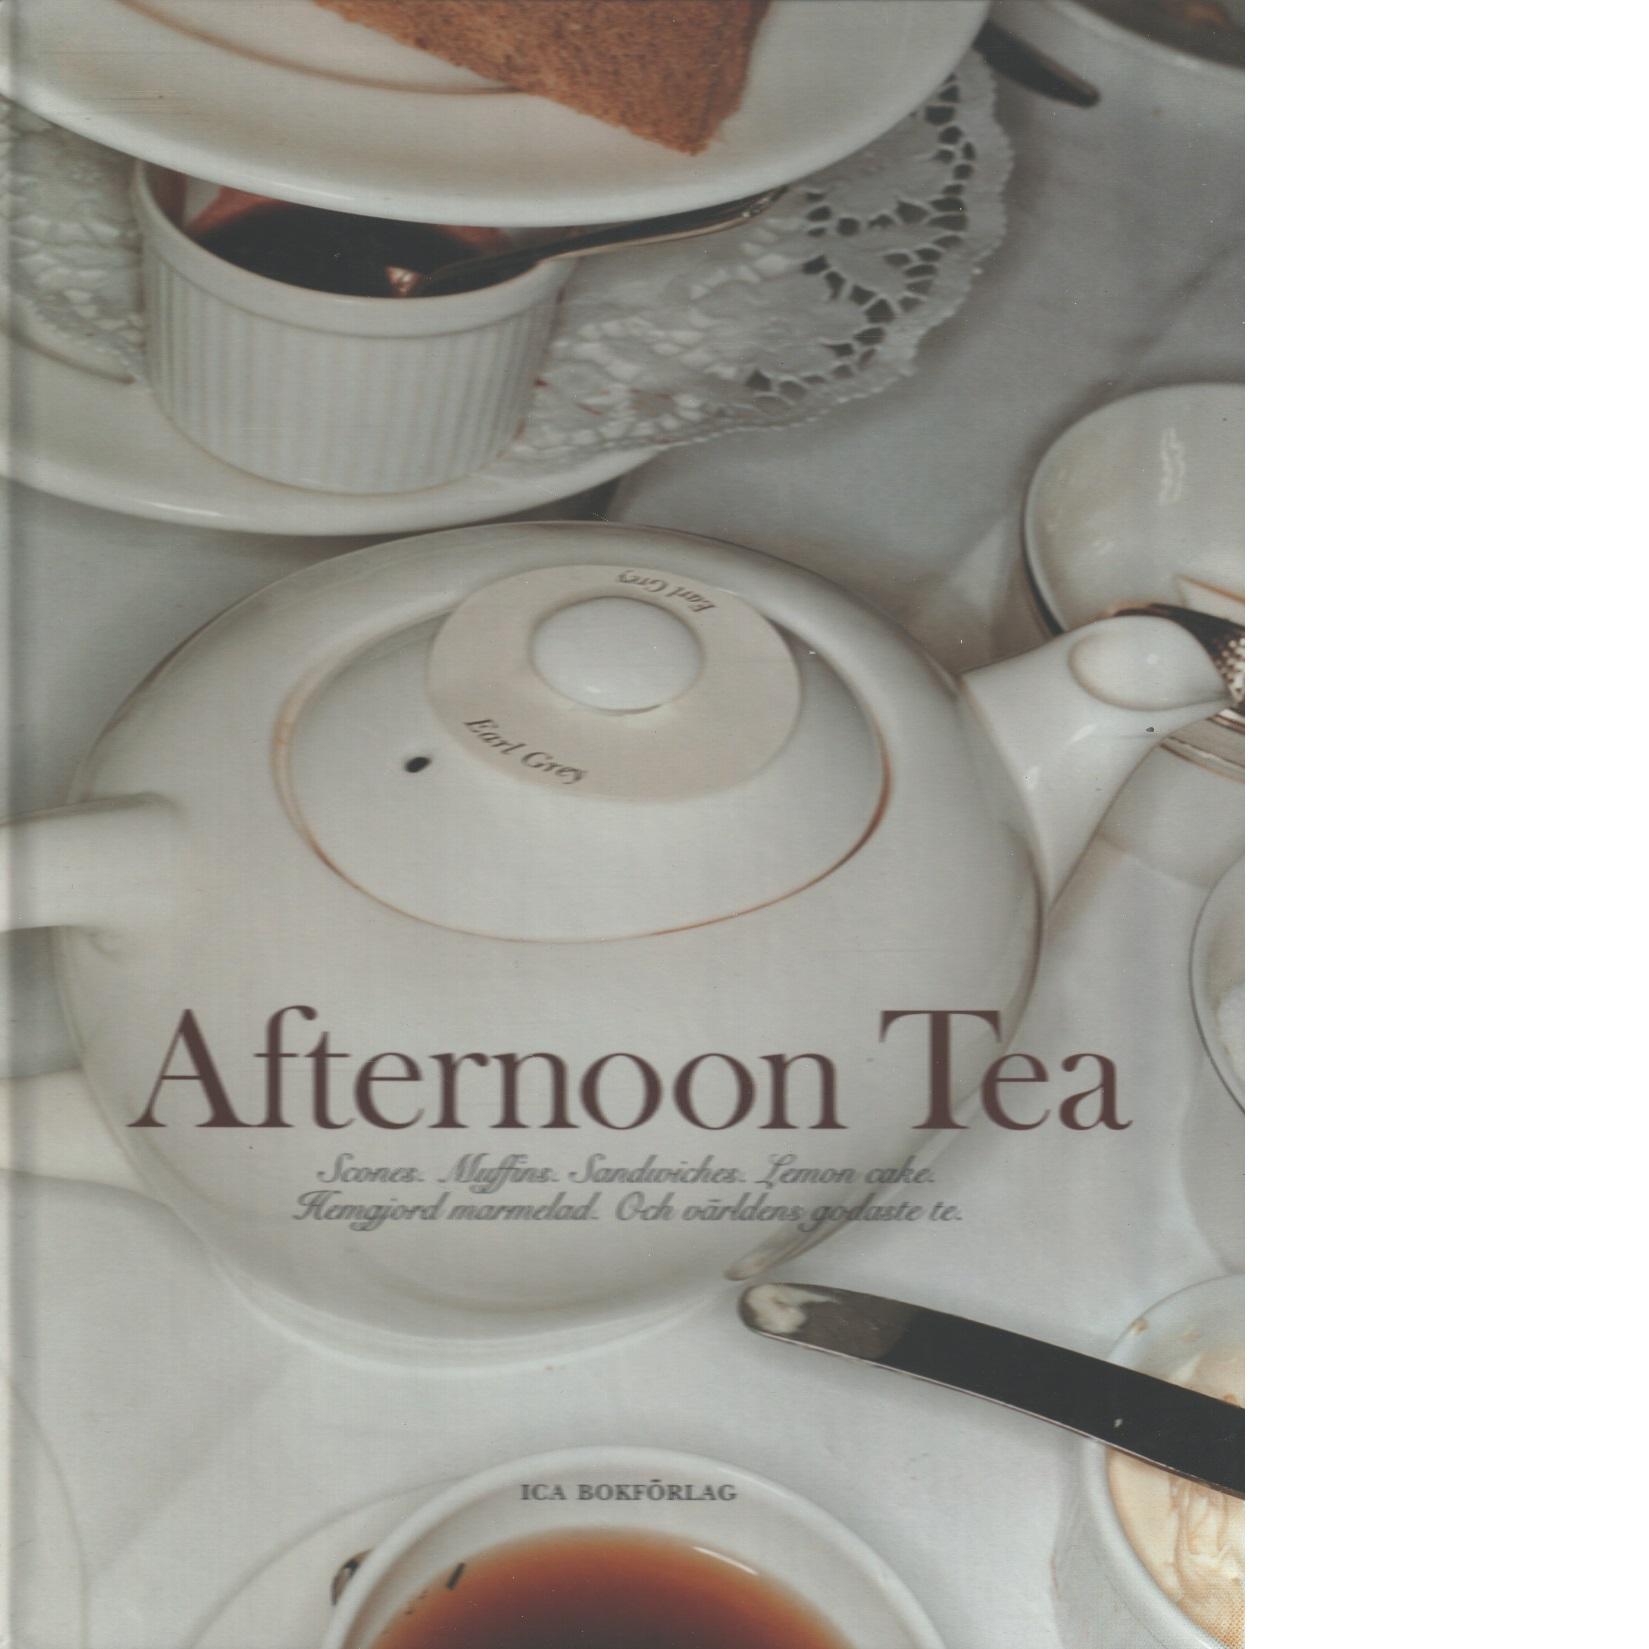 Afternoon tea : Scones, muffins, sandwiches, lemon cake, hemgjord marmelad och världens godaste te - Red.